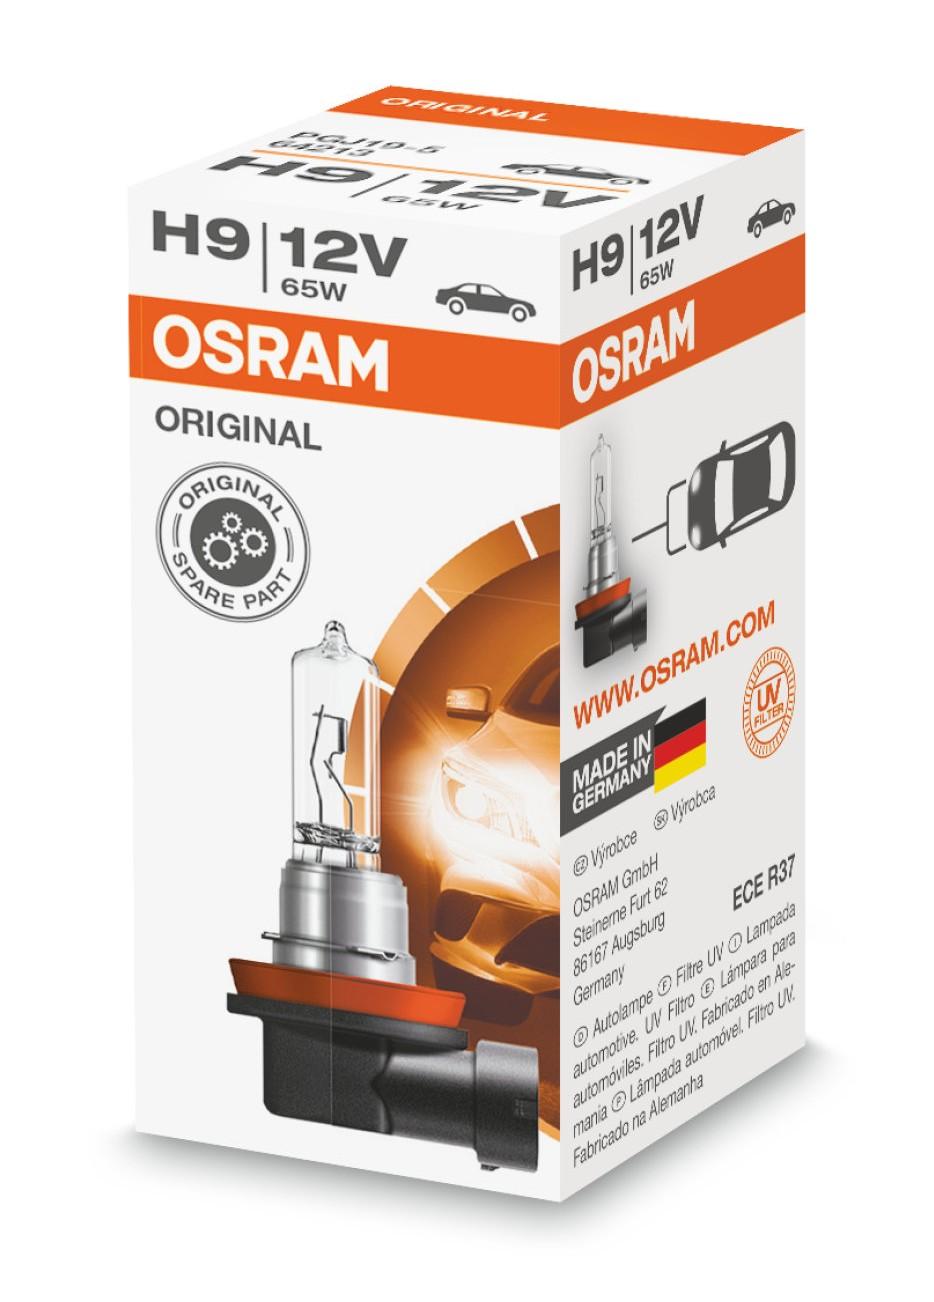 Halogenlampa H9 65W